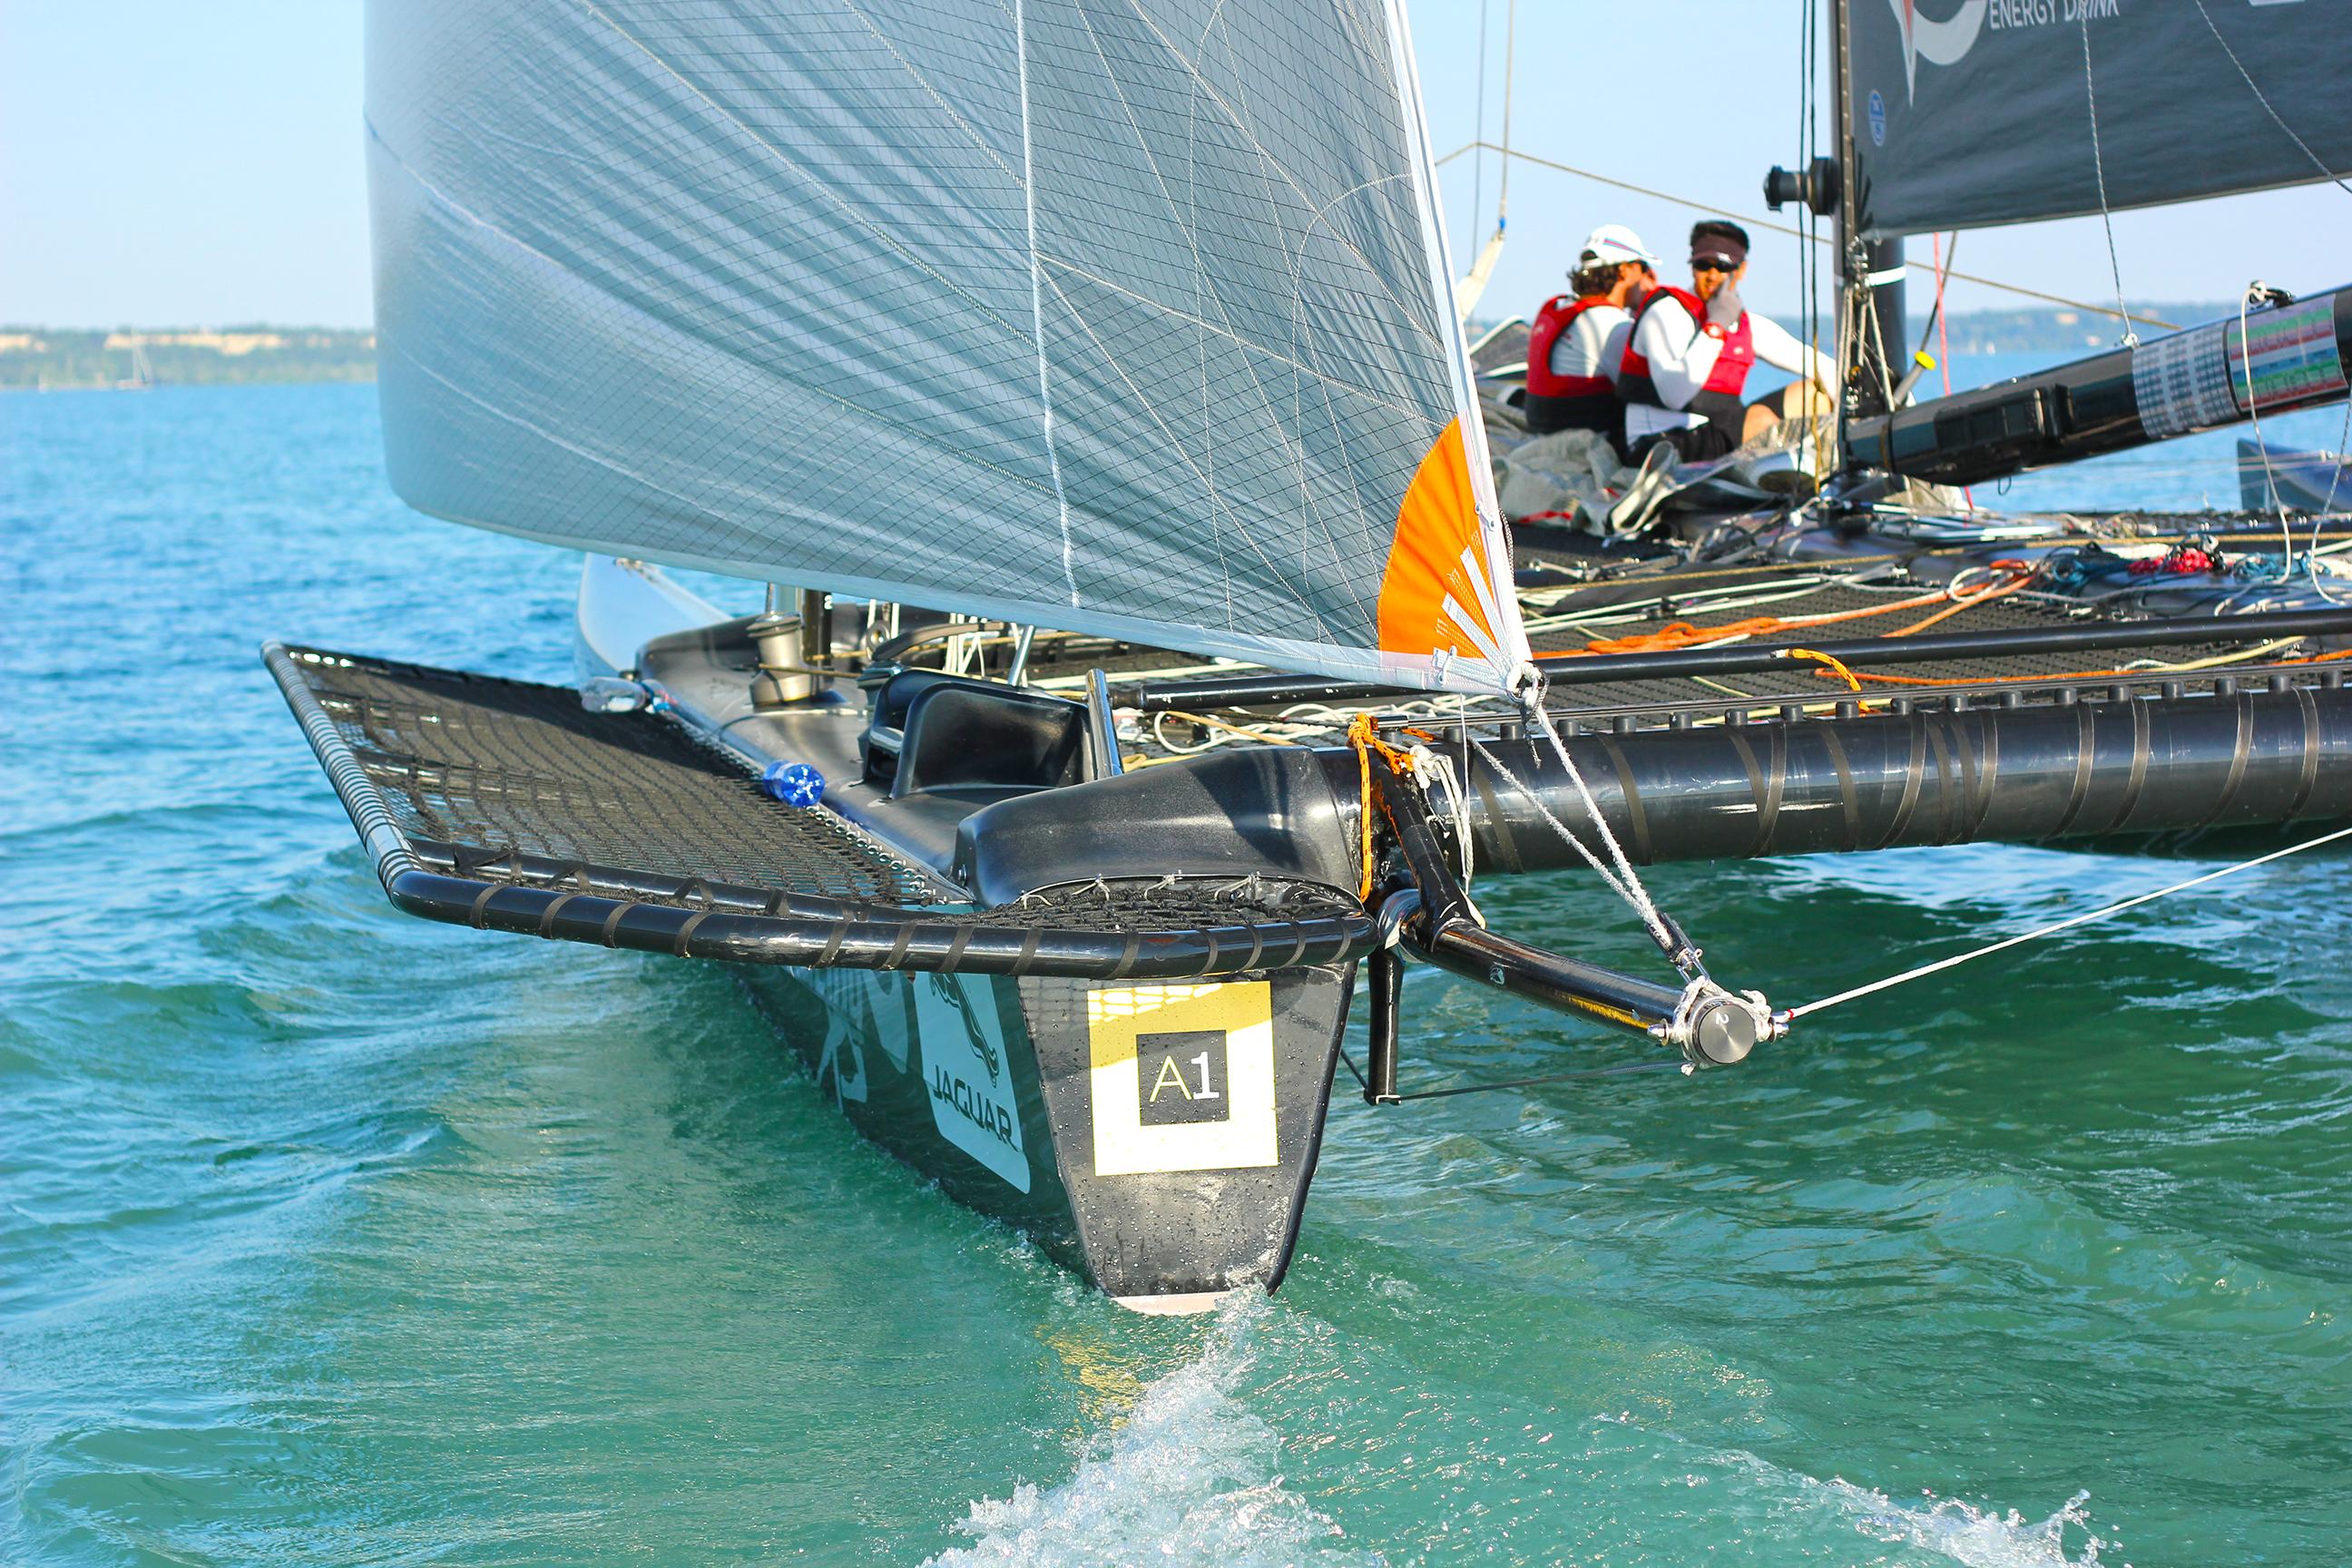 Litkey Farkas Farsudar Decision 35 Catamaran Kekszalag Vitorlazas Sailing HAJOZASHU12